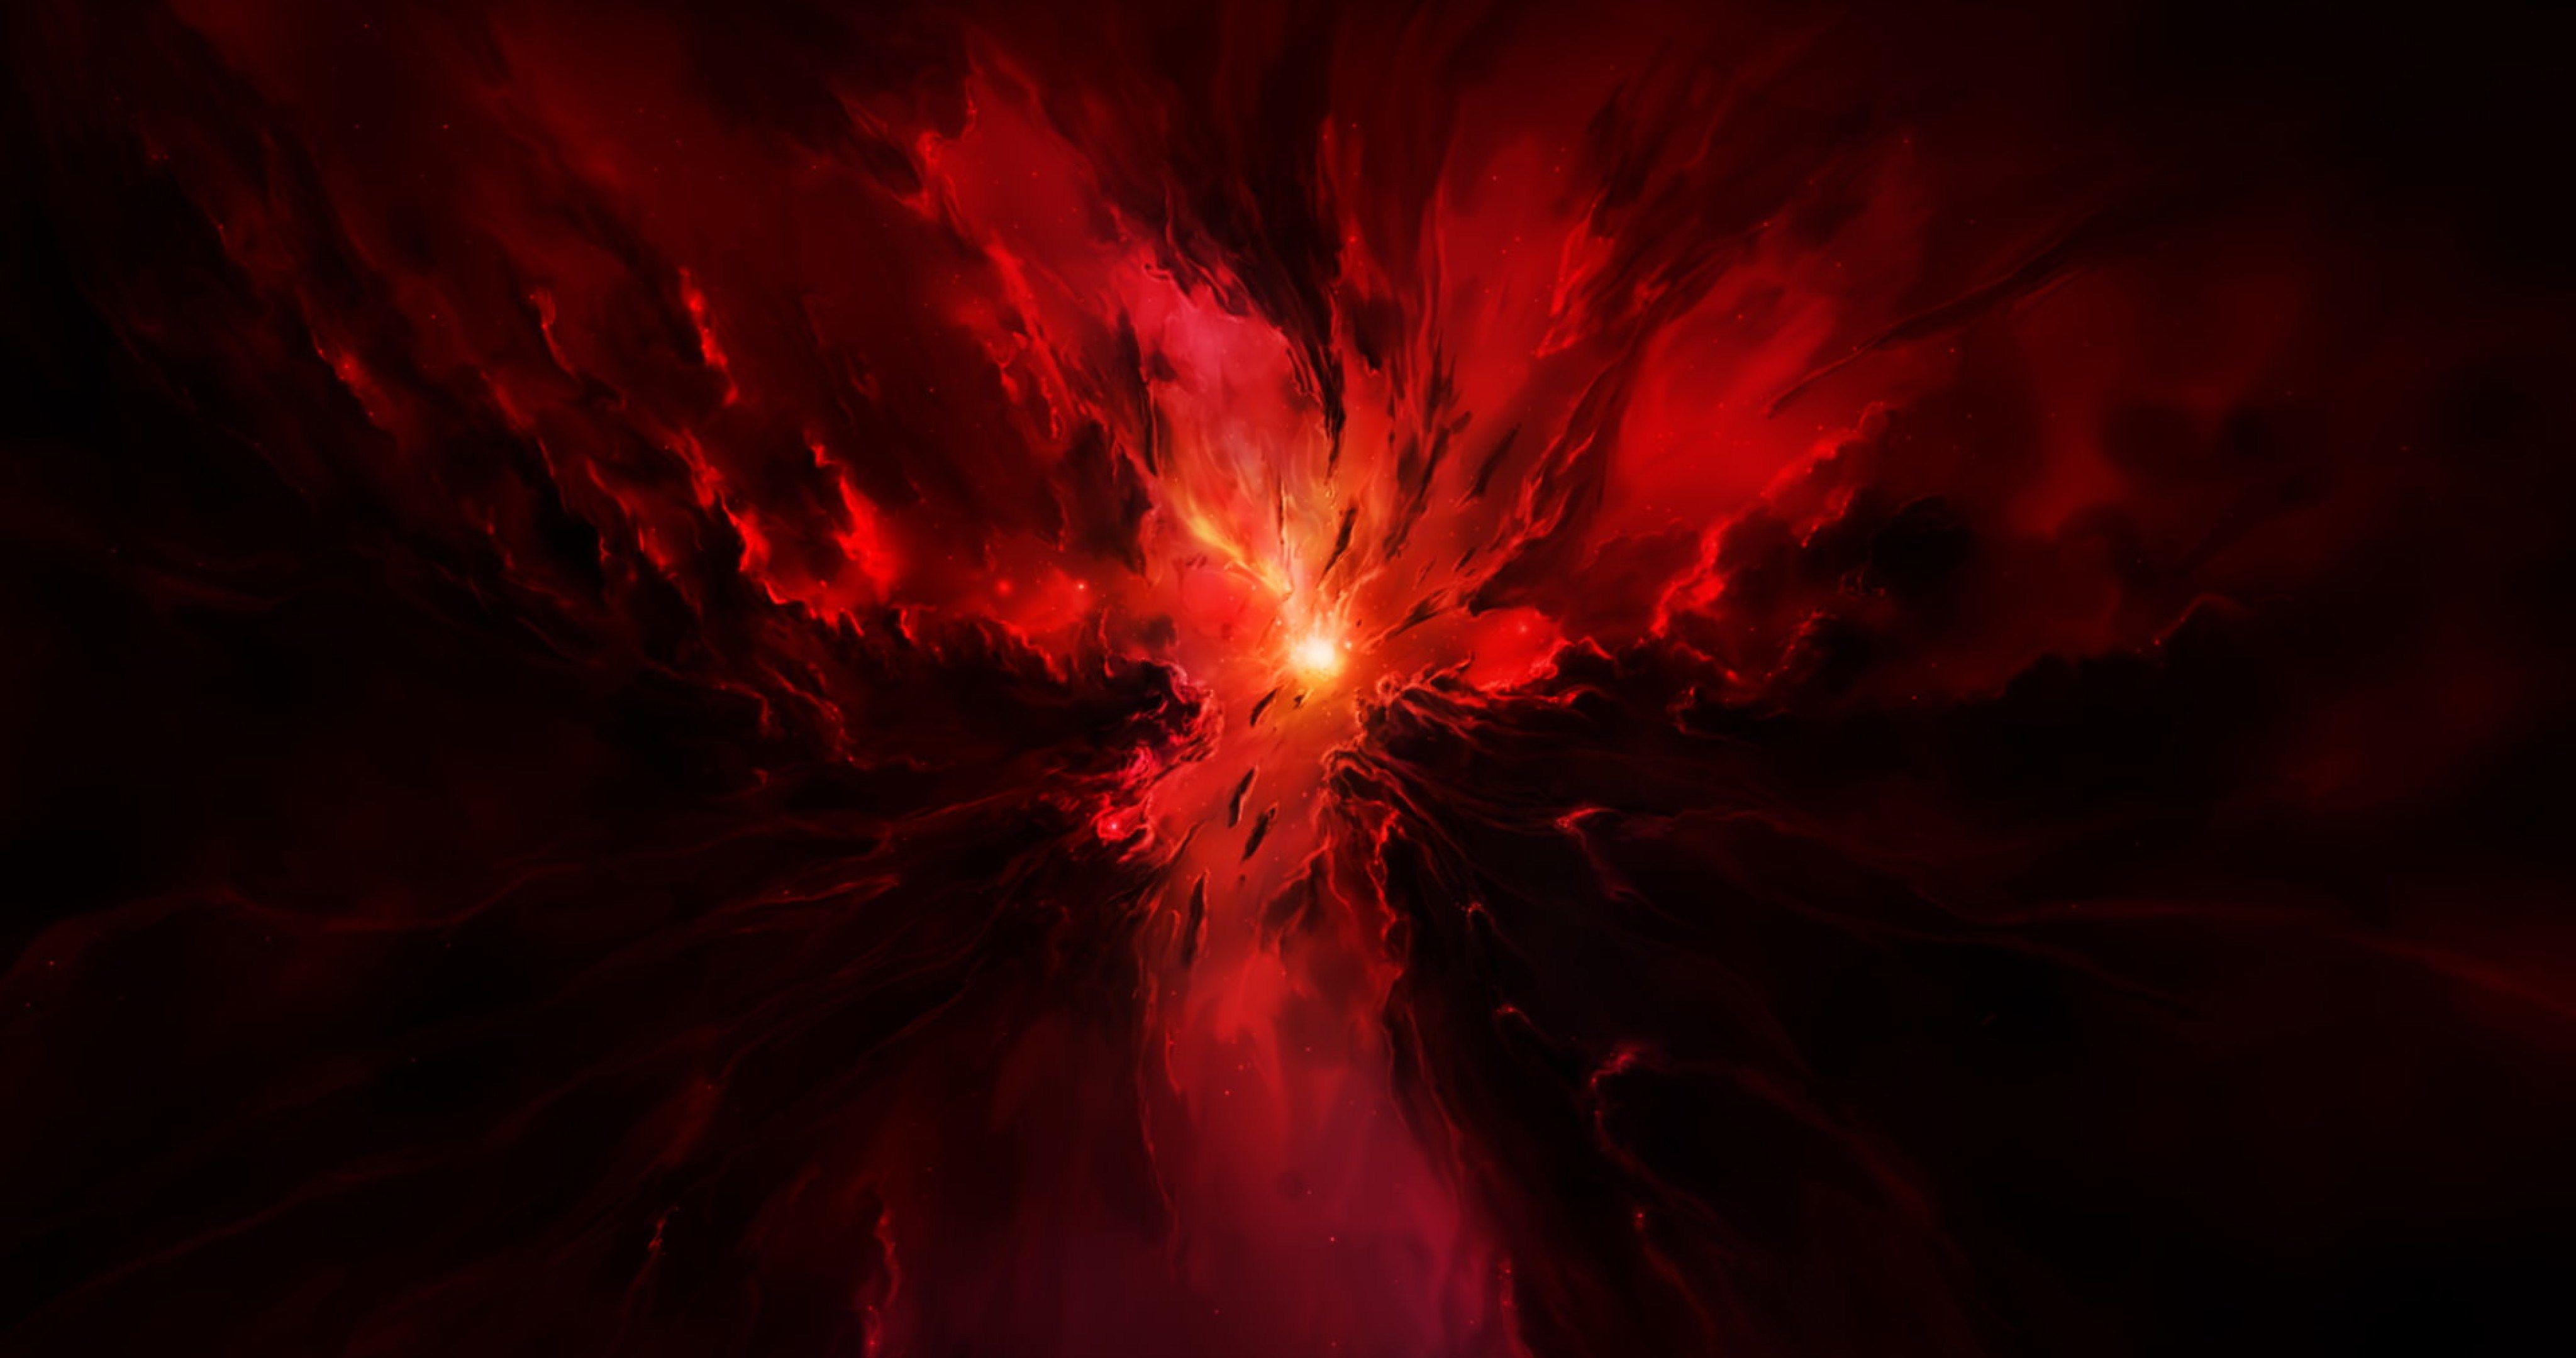 Star Nova Nebula 4k Ultra Hd Wallpaper Red Abstract Painting Space Artwork Nebula Wallpaper